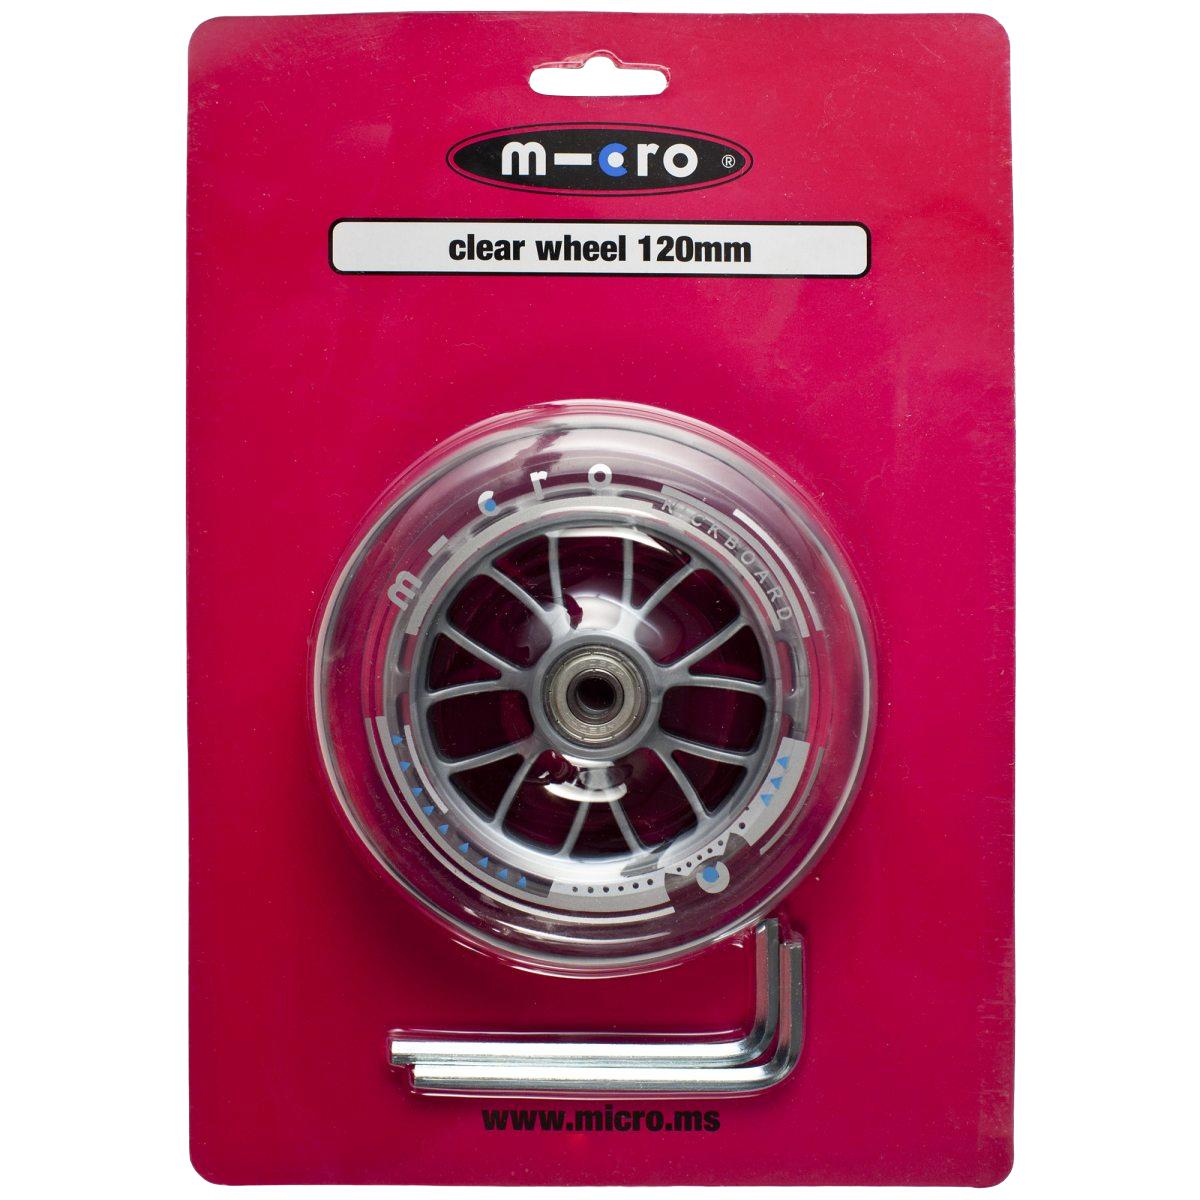 Micro wheel 120mm (Sprite front), sparkesykkelhjul